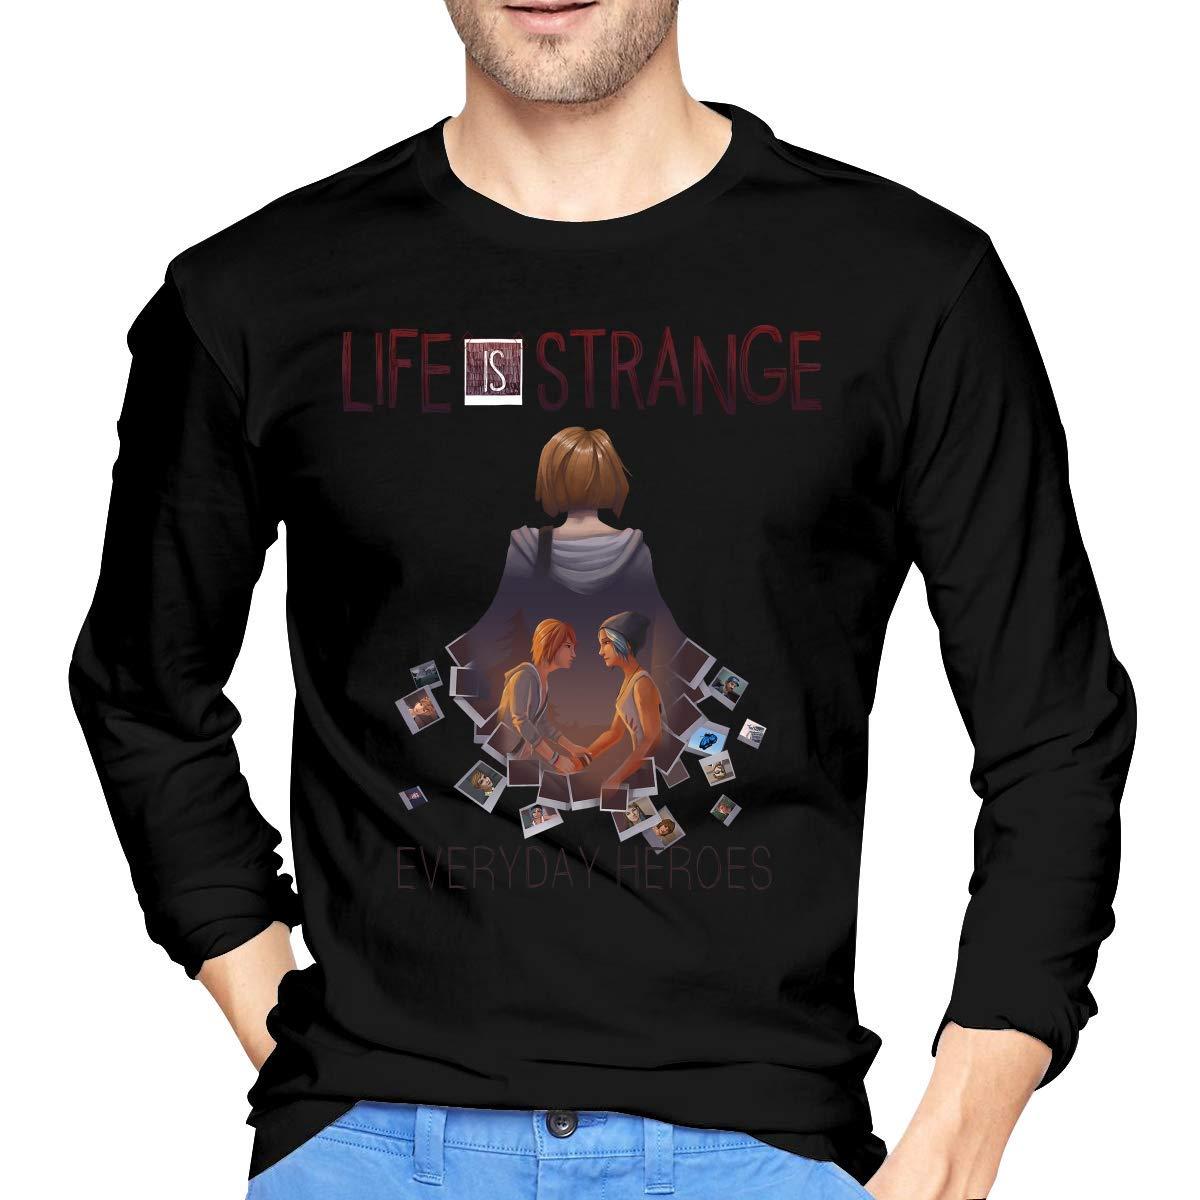 Fssatung S Life Is Strange T Shirt Black